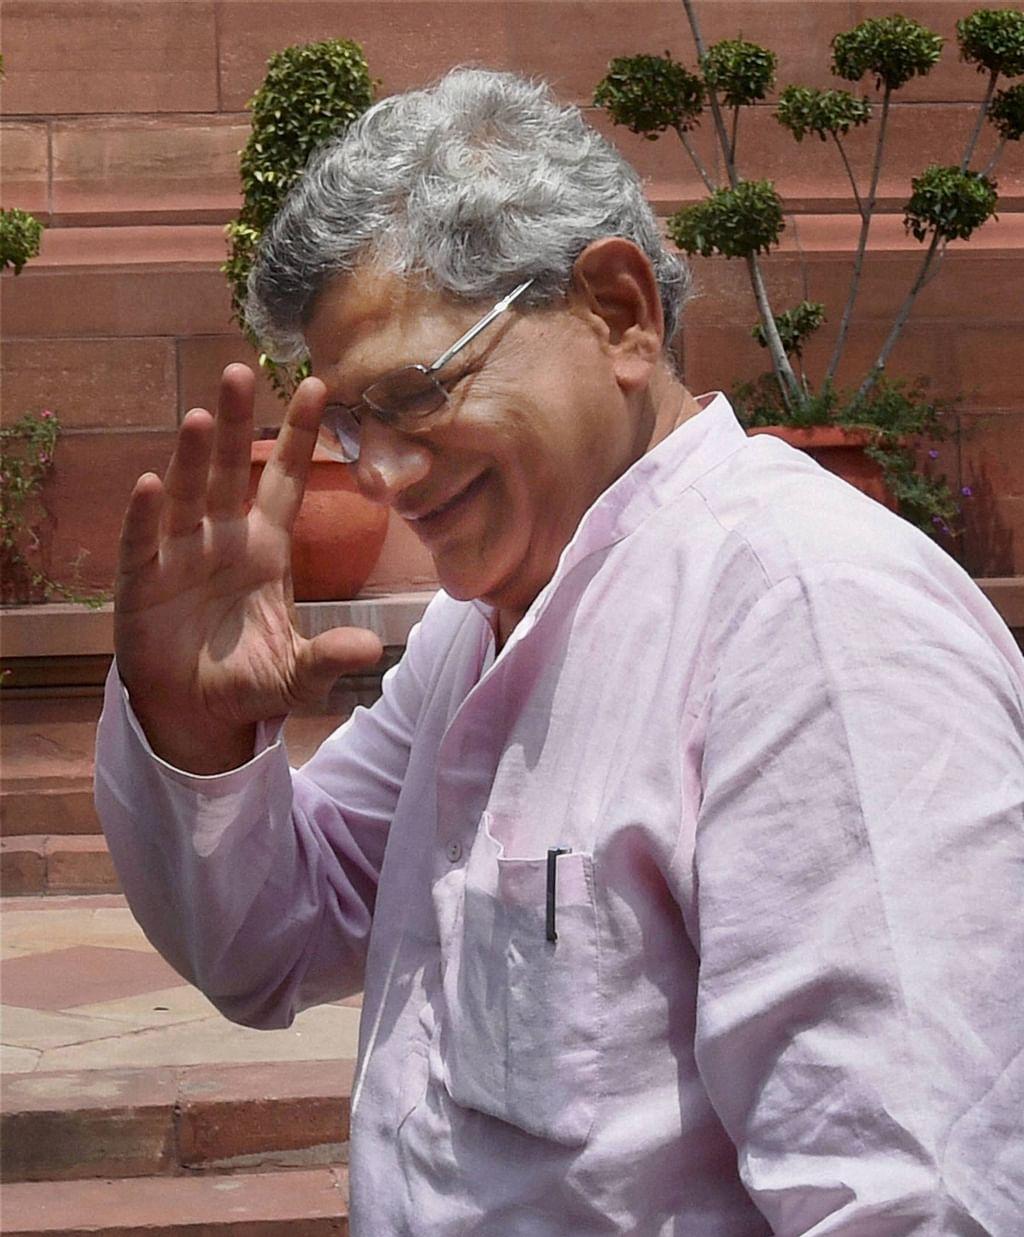 CPI(M) General Secretary Sitaram Yechury arrives for monsoon session. (Photo: PTI)